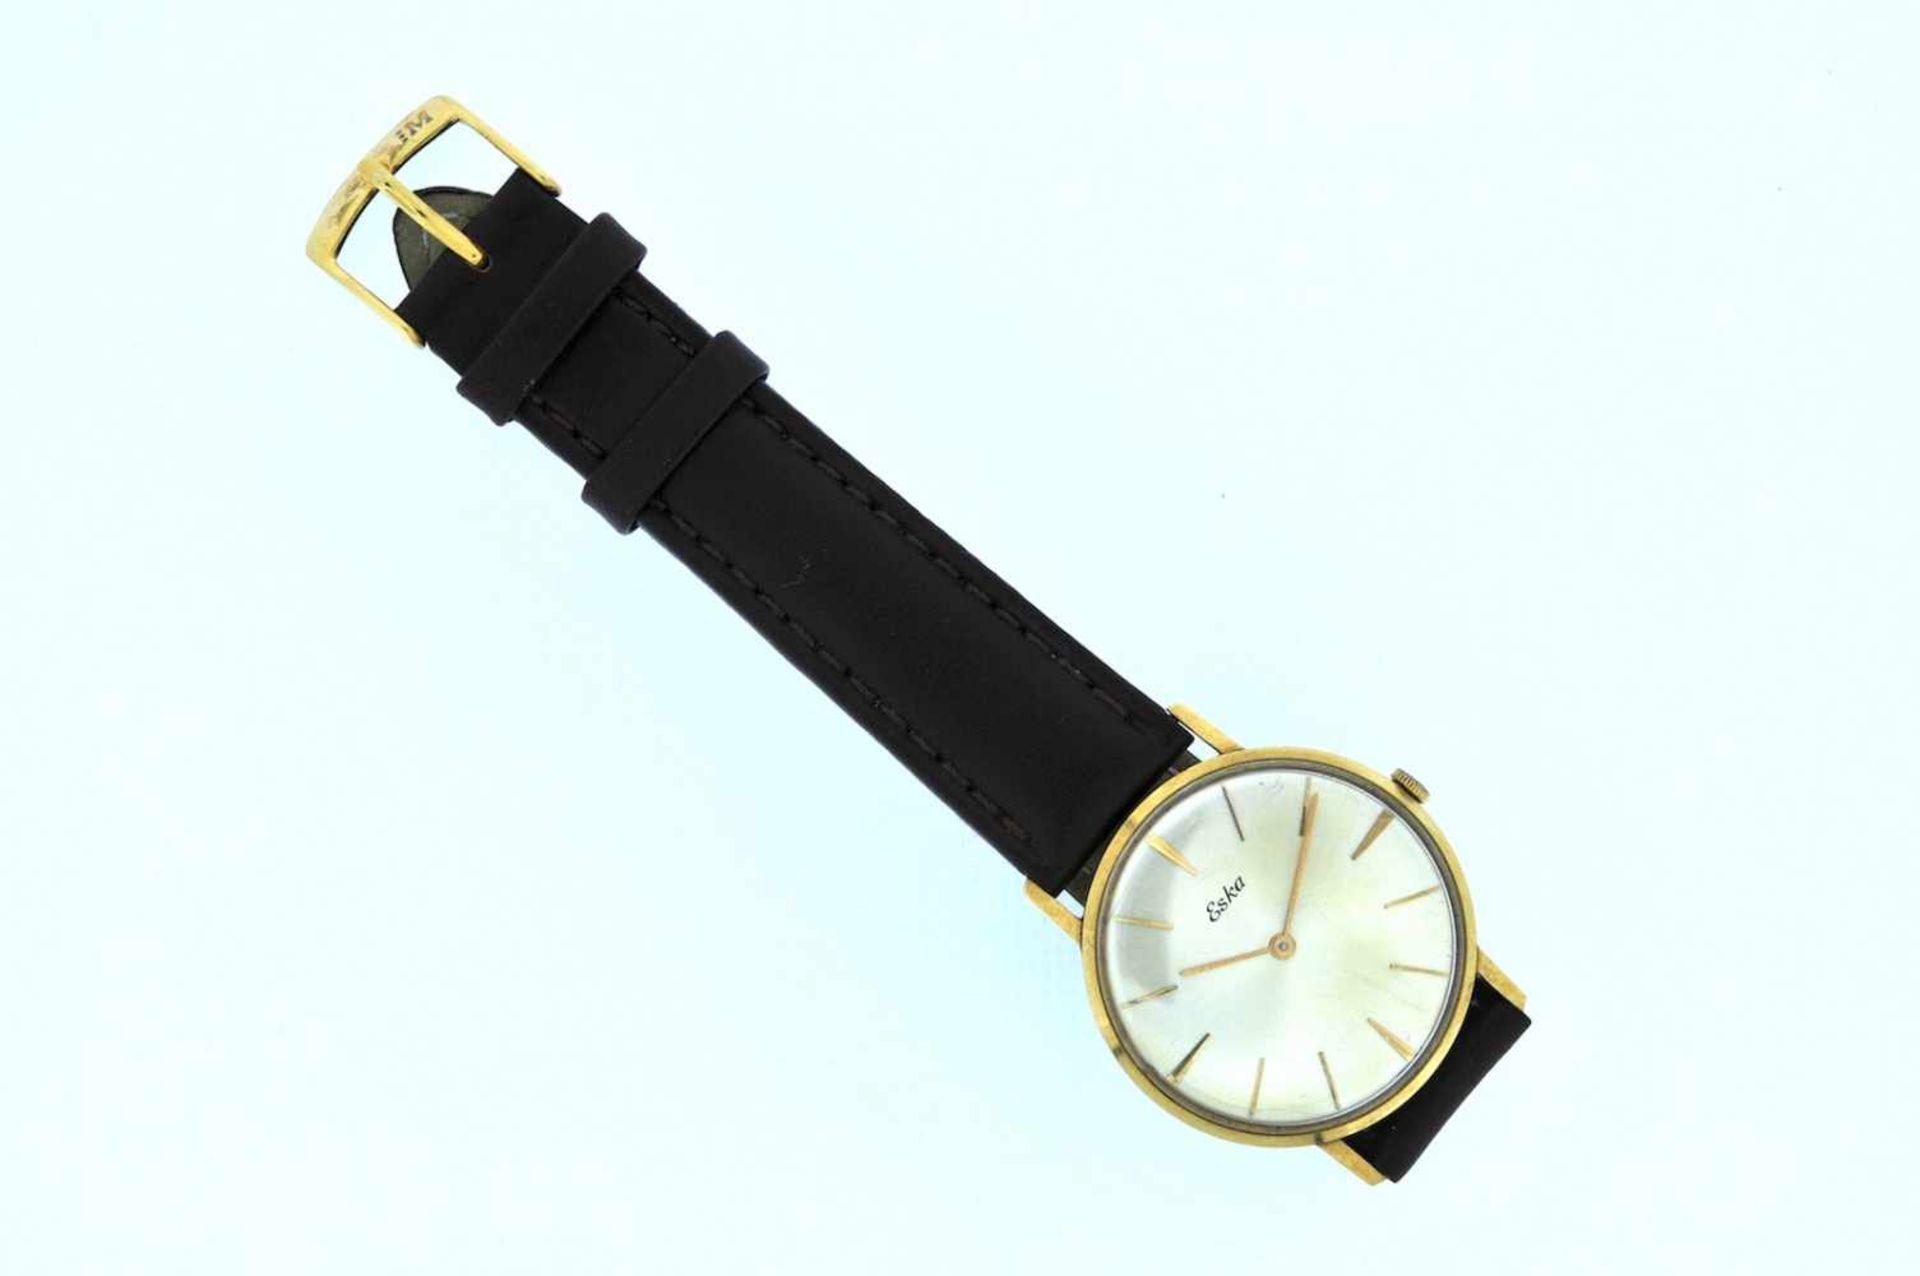 Eska Goldene Armbanduhr an Lederband, Eska, Handaufzug, Ankerwerk, Werkservice empfohlen, 28,1 g.